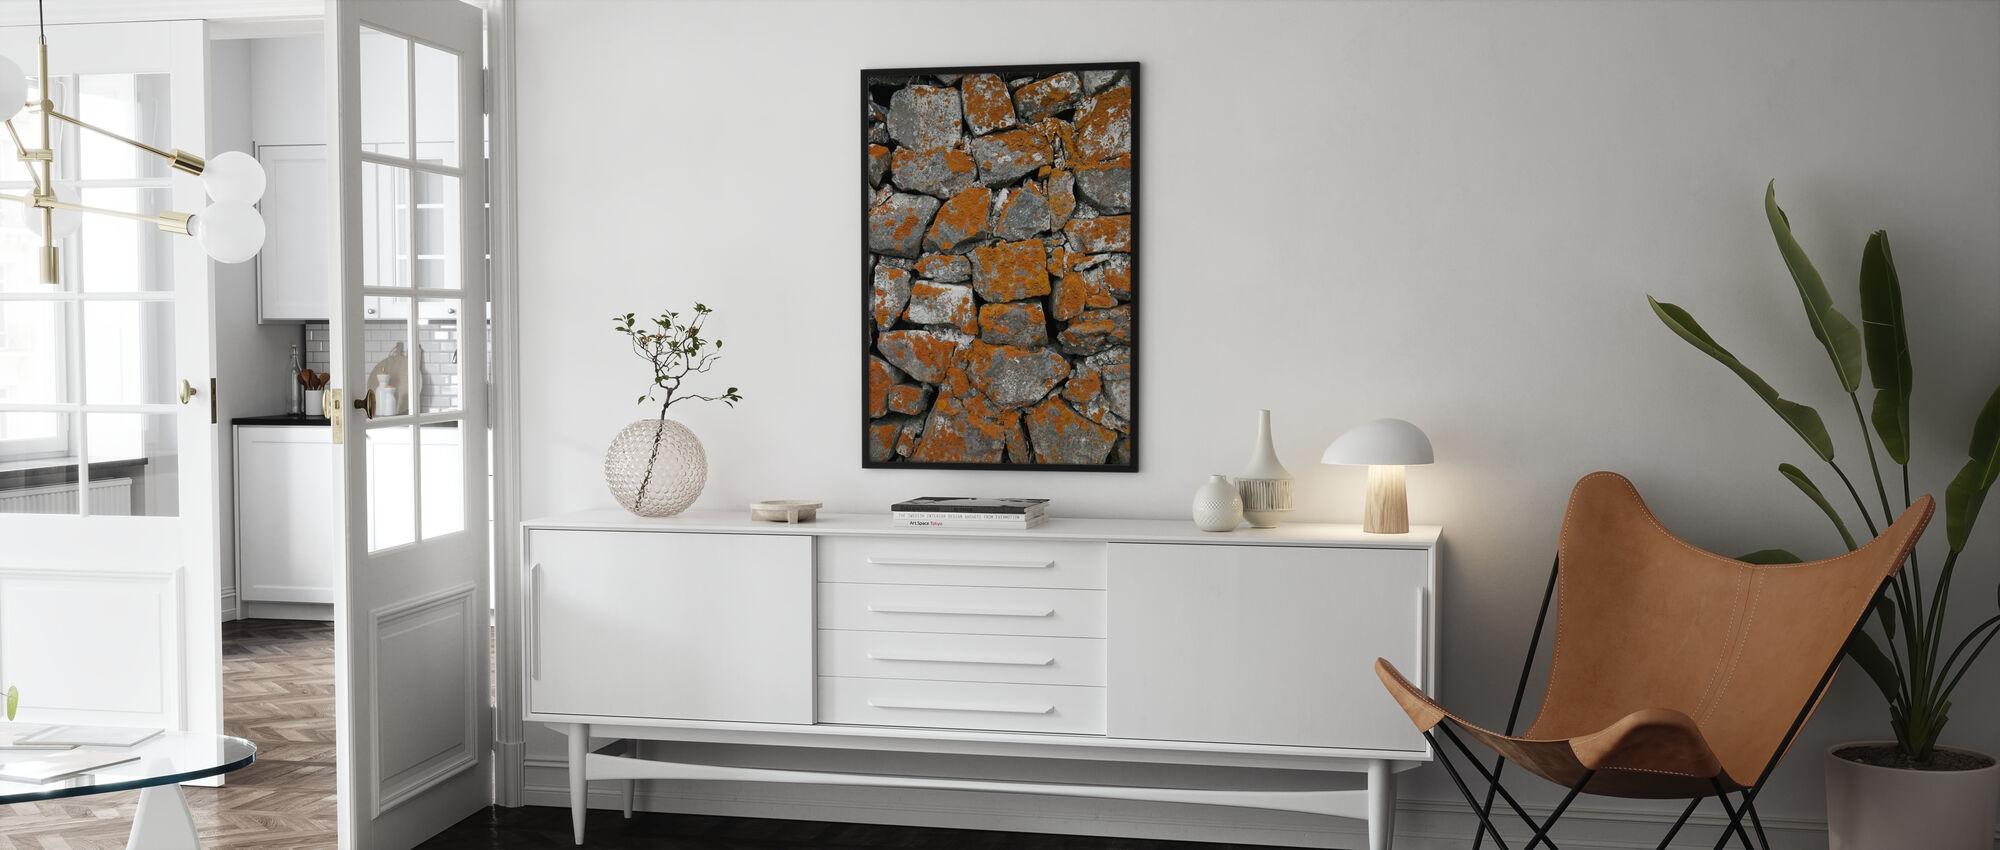 Icelandic Stonewall - Poster - Living Room